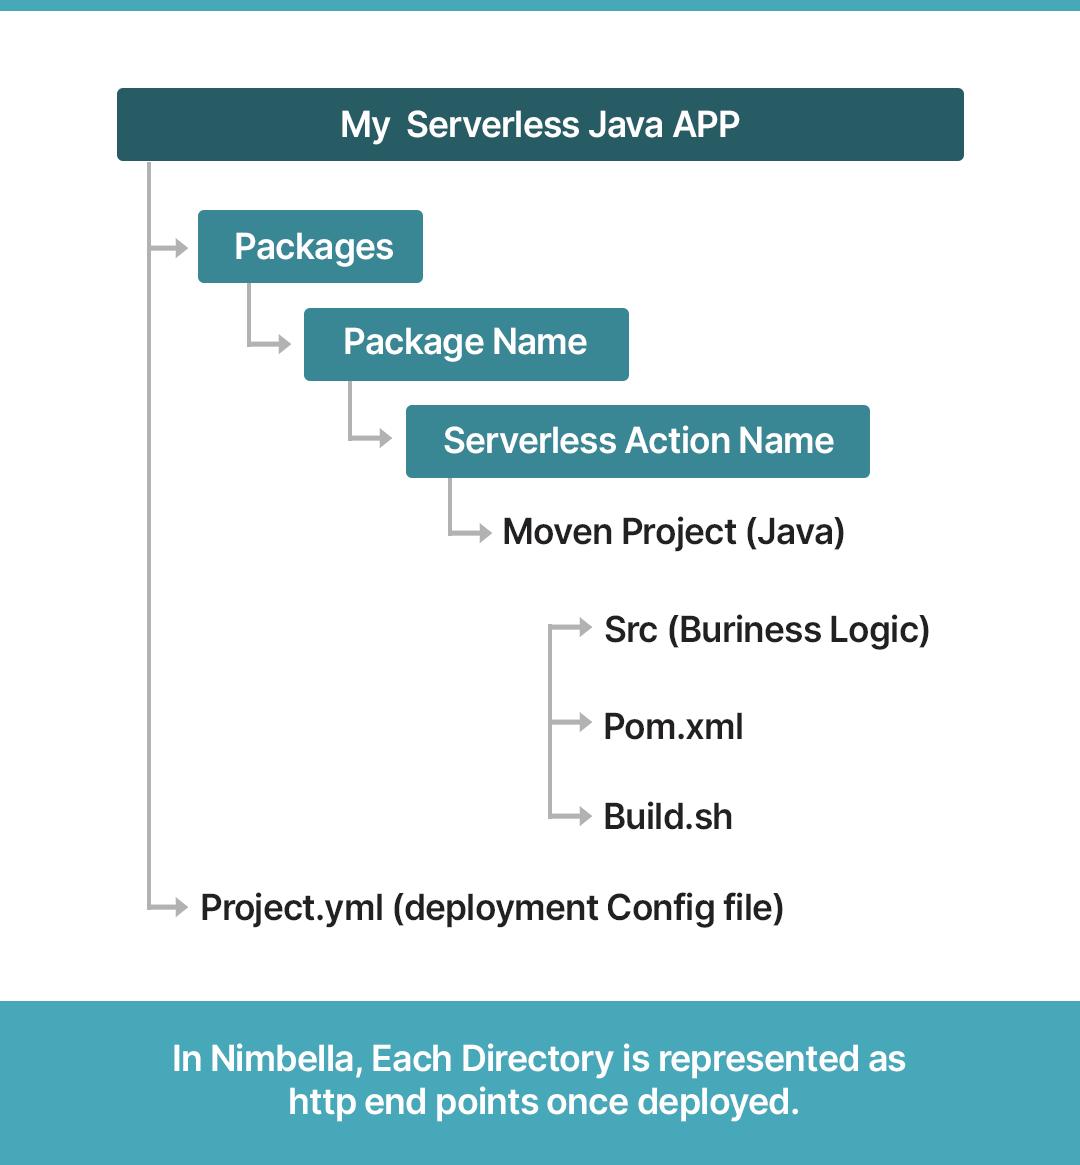 Serverless Java App file structure